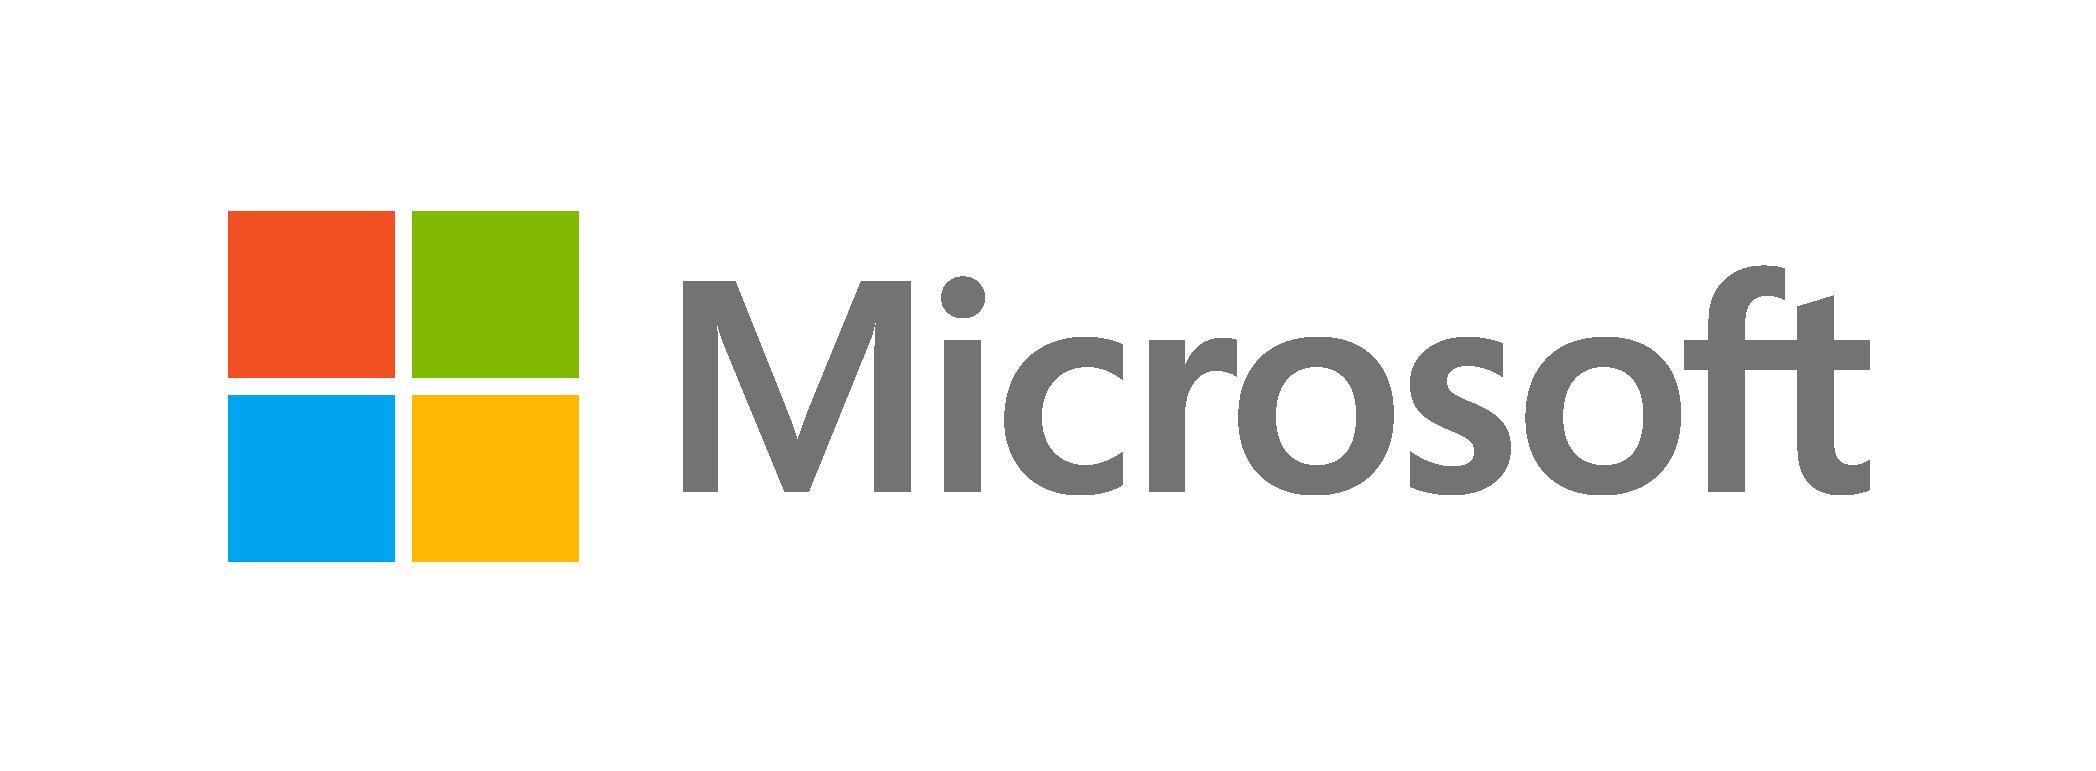 28413-3-microsoft-logo-transparent-background